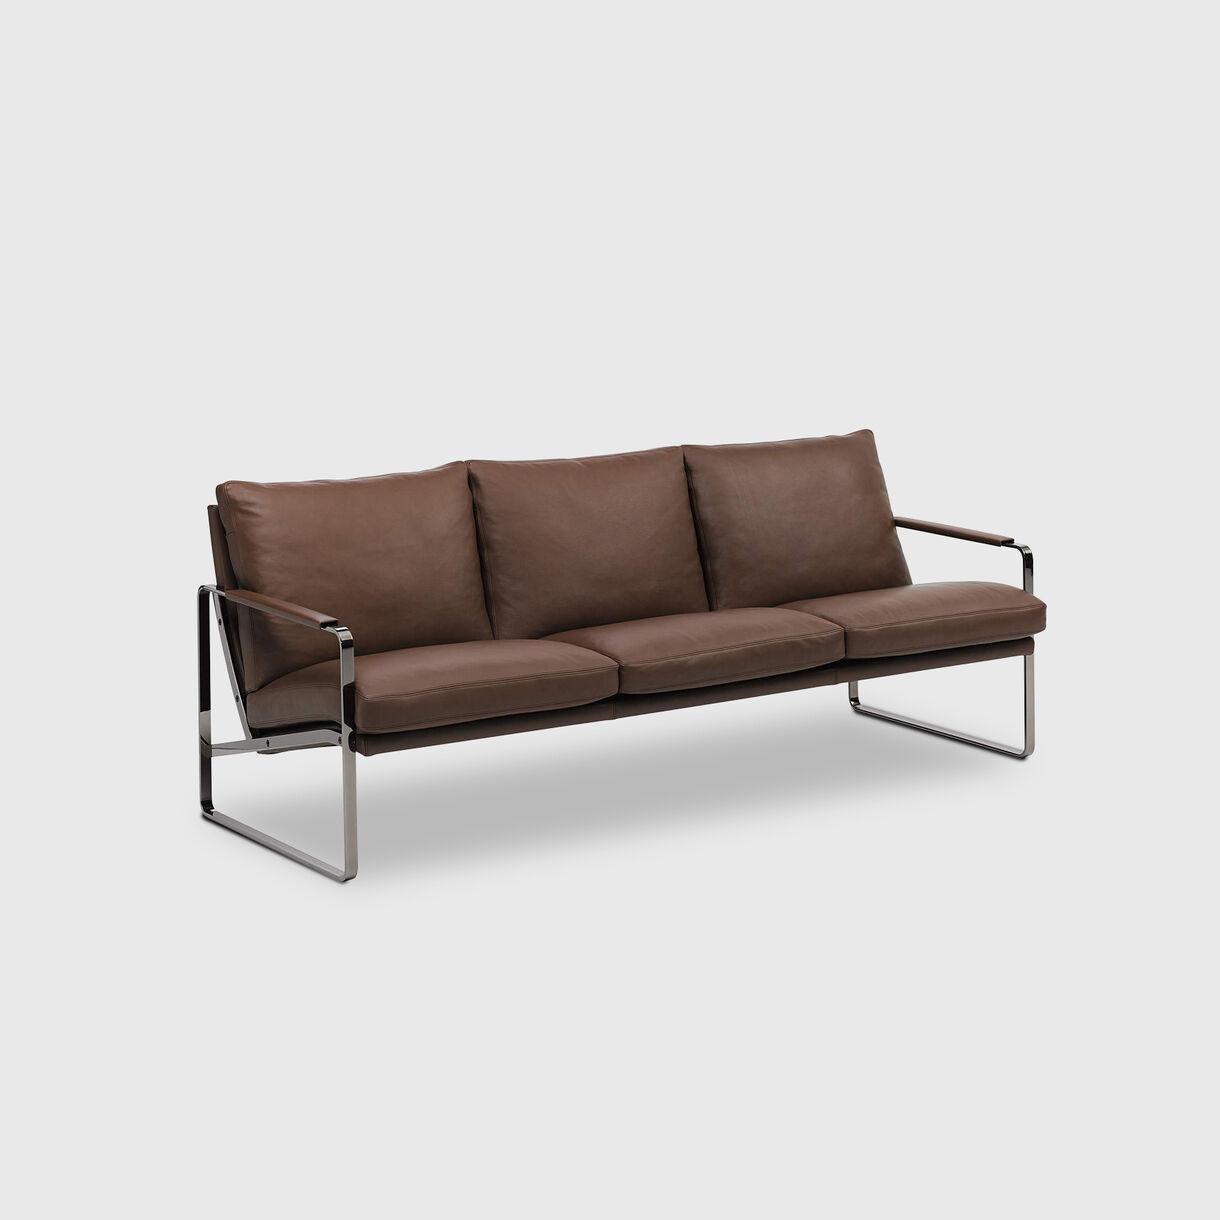 Fabricus Sofa